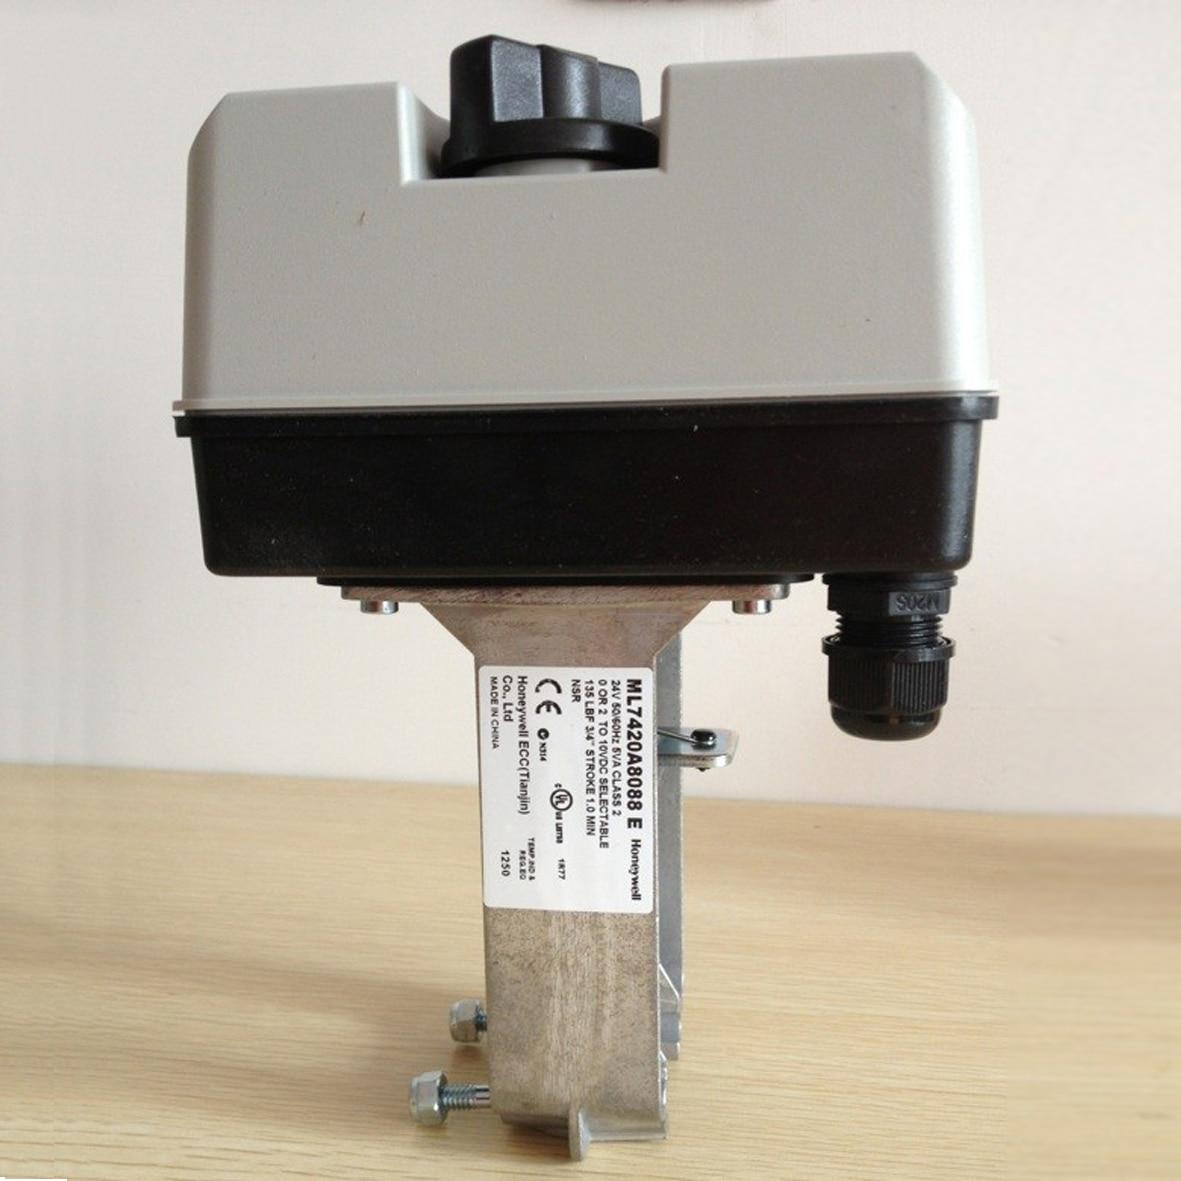 Genuine  regulating PI-type electric valve actuator ML7420A8088-E ML7421B1023-E ML7421A1032-EGenuine  regulating PI-type electric valve actuator ML7420A8088-E ML7421B1023-E ML7421A1032-E